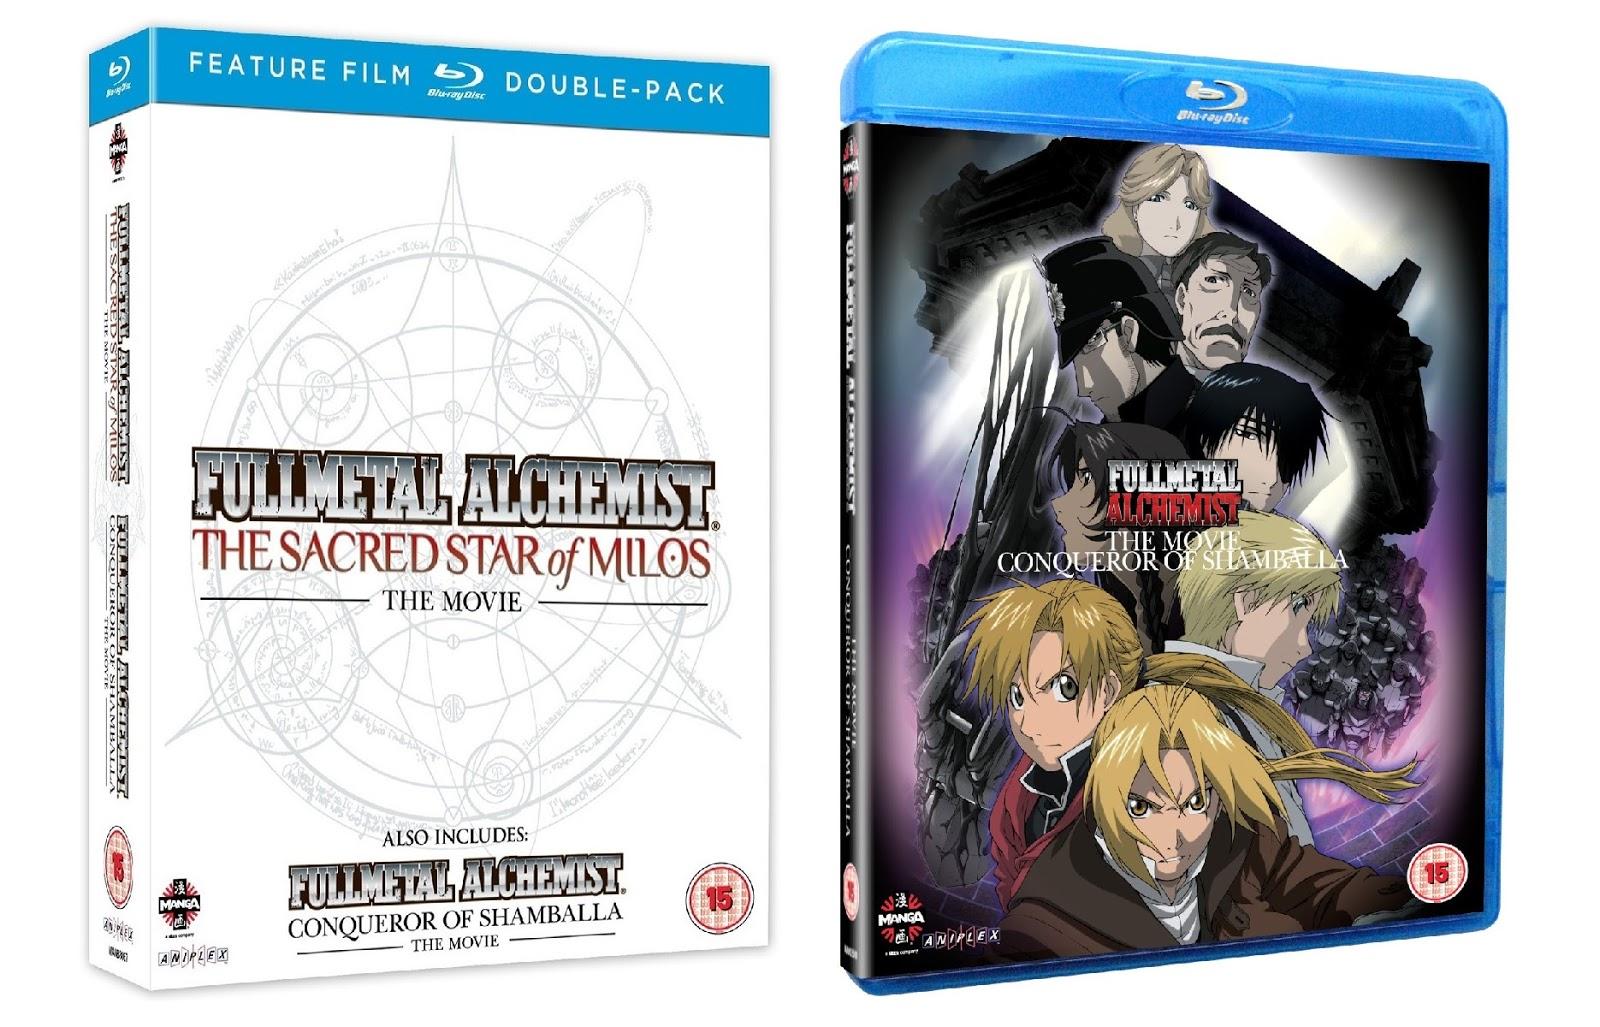 Anime on Blu-ray!: Fullmetal Alchemist - The movies 1 & 2 Double Pack & Fullmetal Alchemist ...